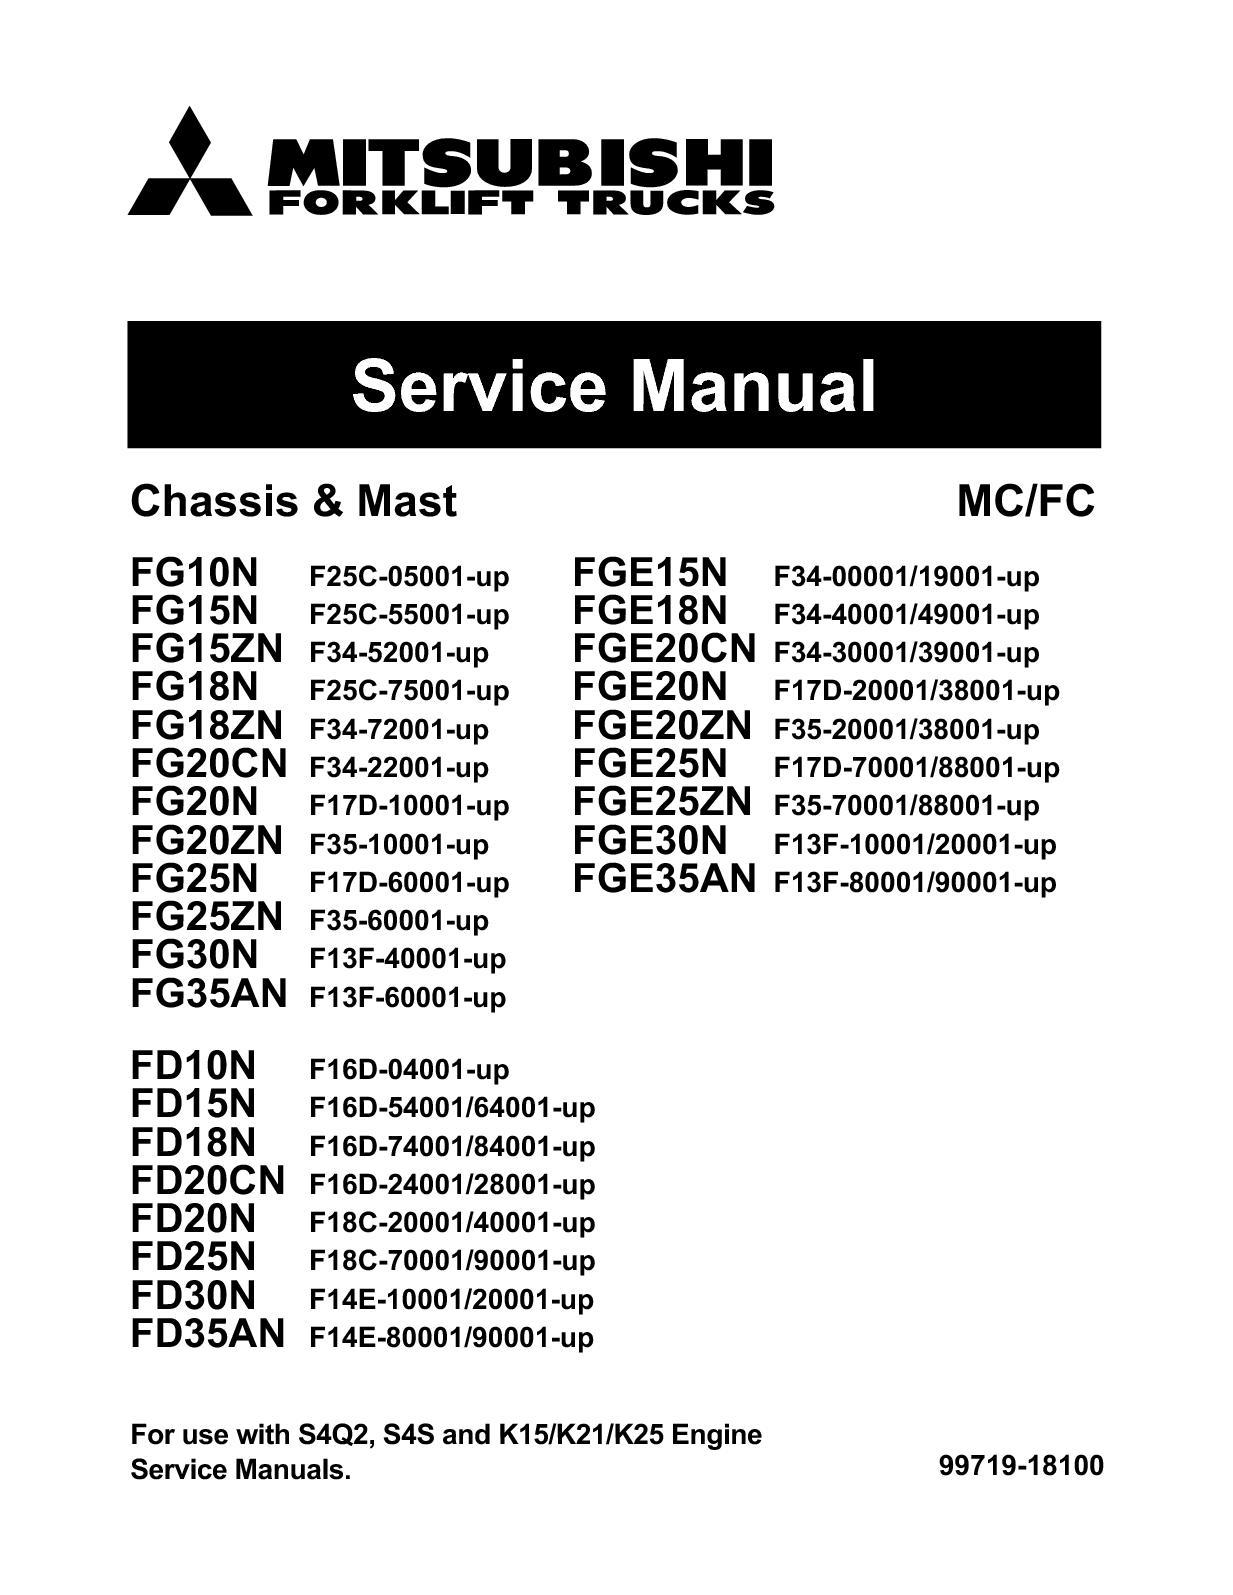 Mitsubishi Forklift Fuse Box Location Diy Enthusiasts Wiring Diagram Calam O Fge15n Trucks Service Repair Manual Rh Calameo Com Colt Eclipse